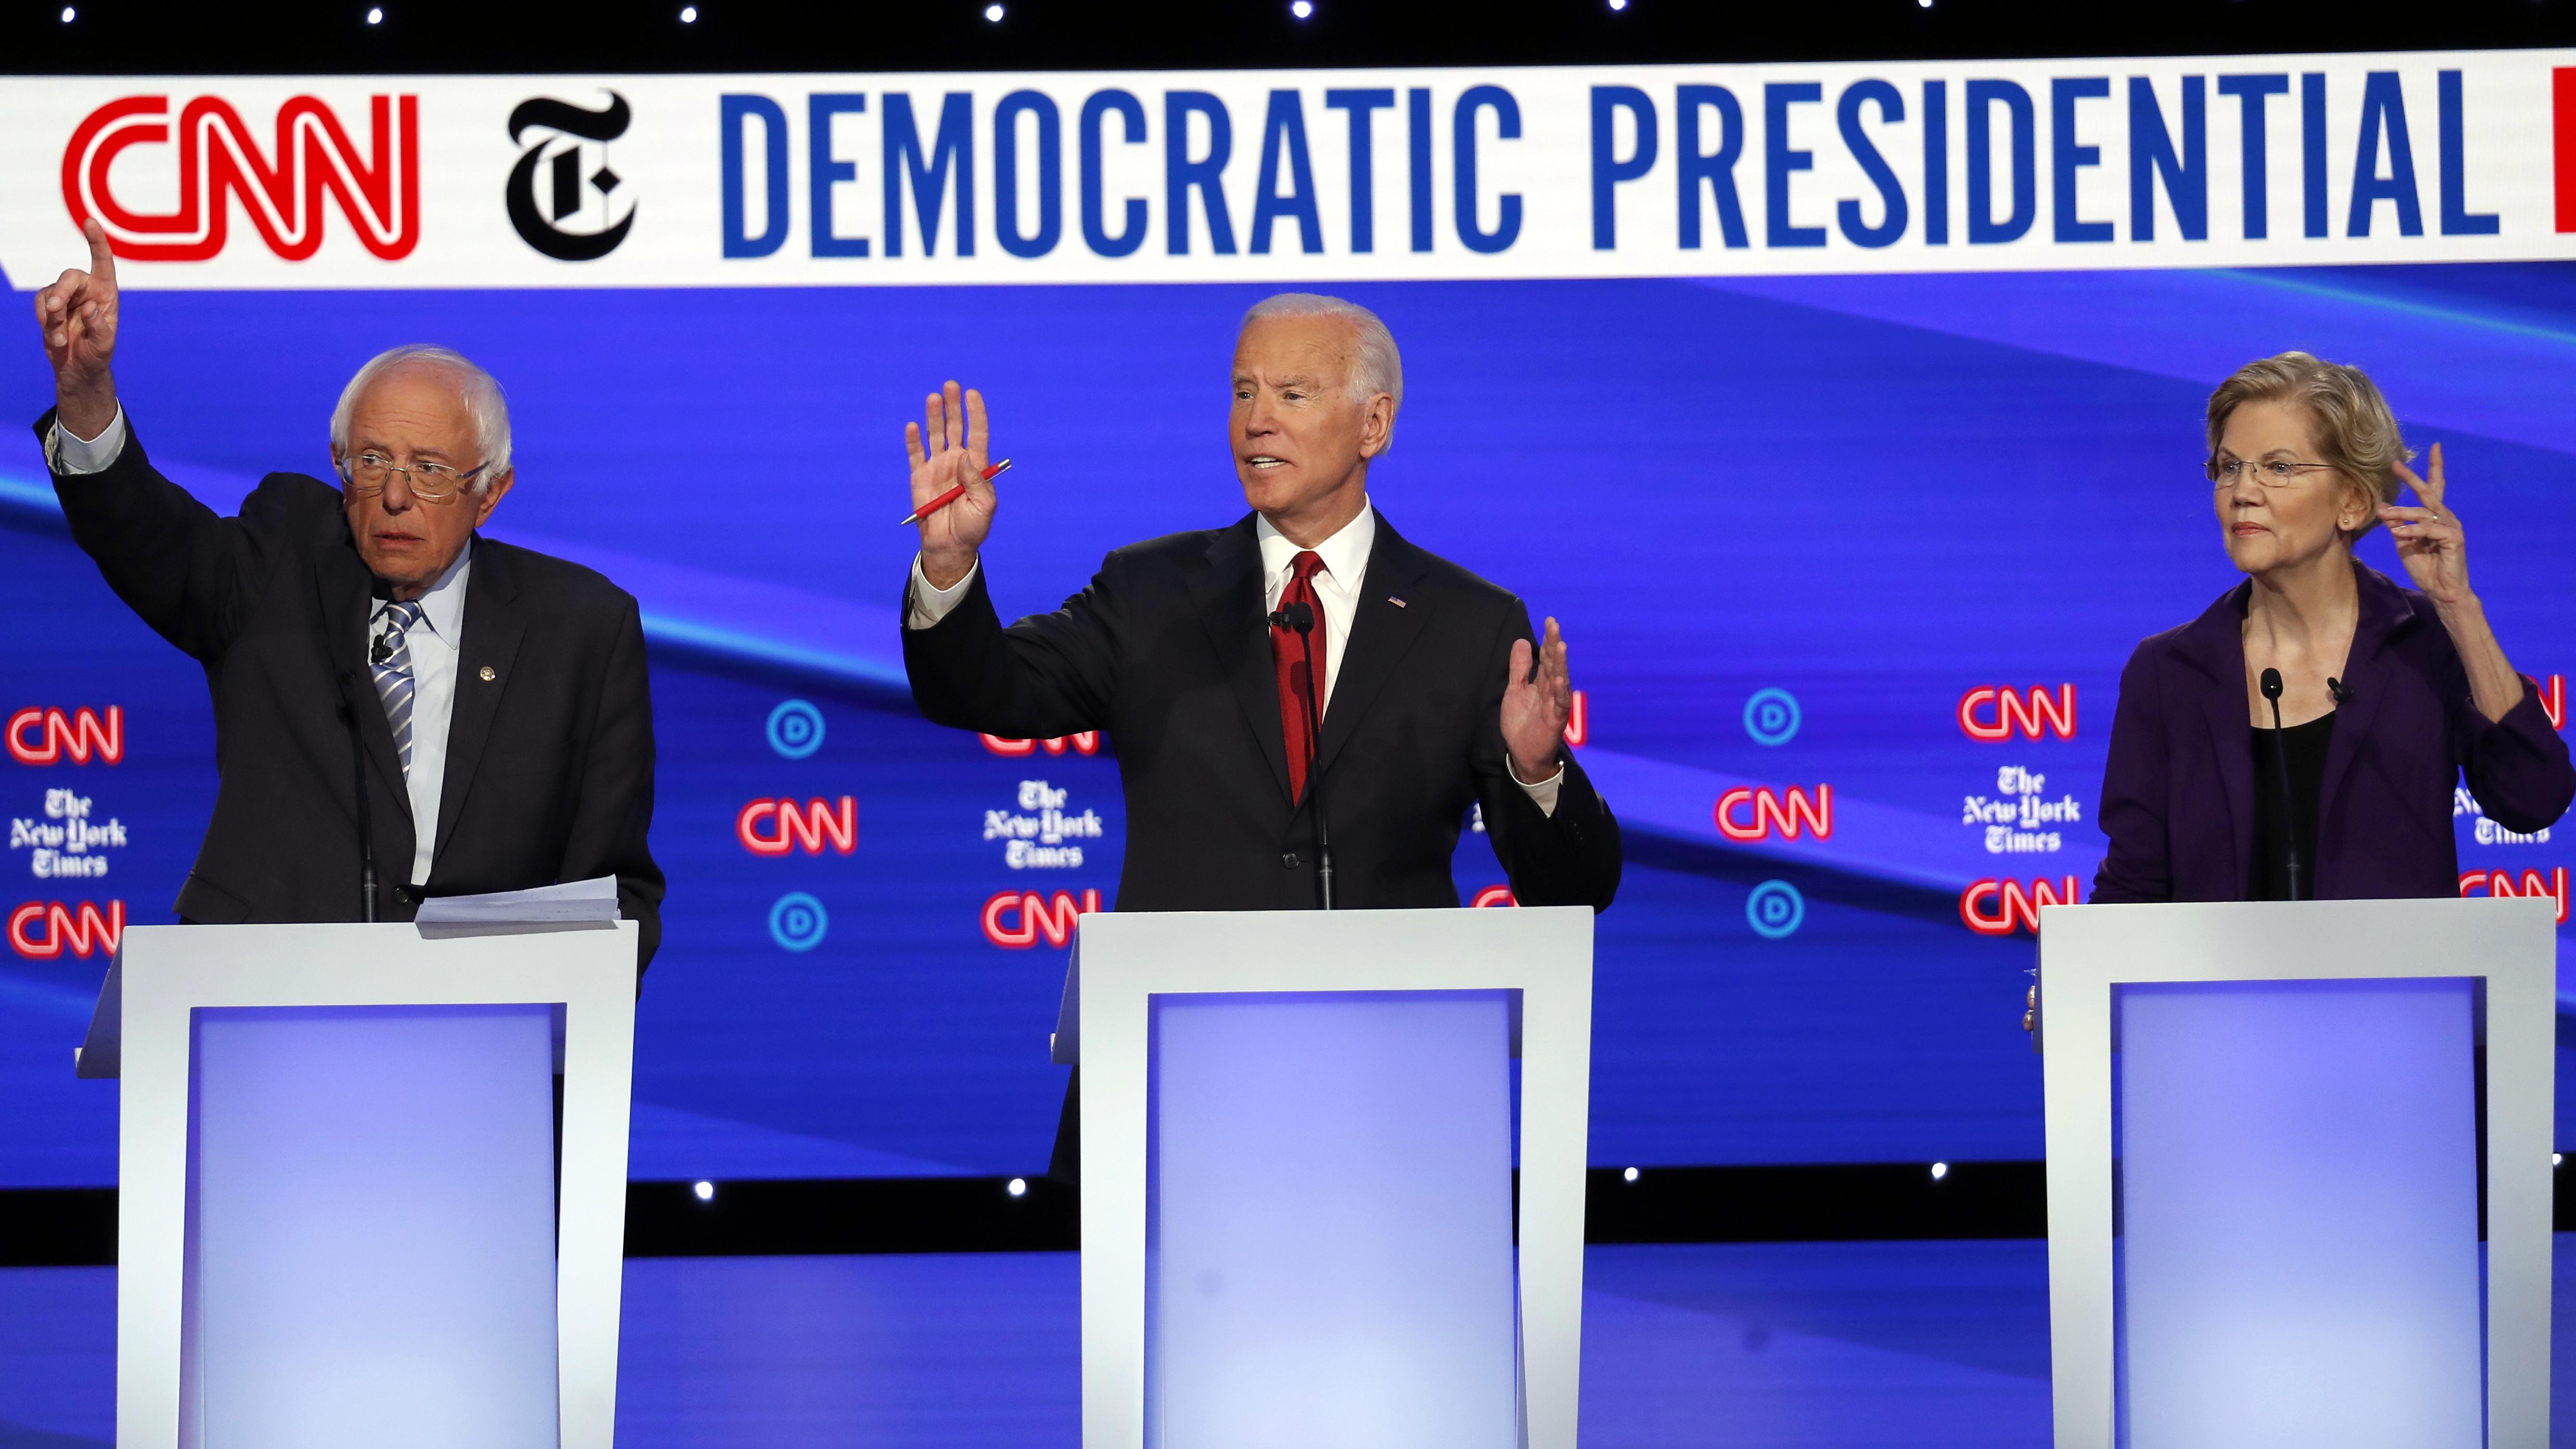 Democratic presidential candidate Sen. Bernie Sanders, I-Vt., left, former Vice President Joe Biden, center, and Sen. Elizabeth Warren, D-Mass., raise their hands to speak.